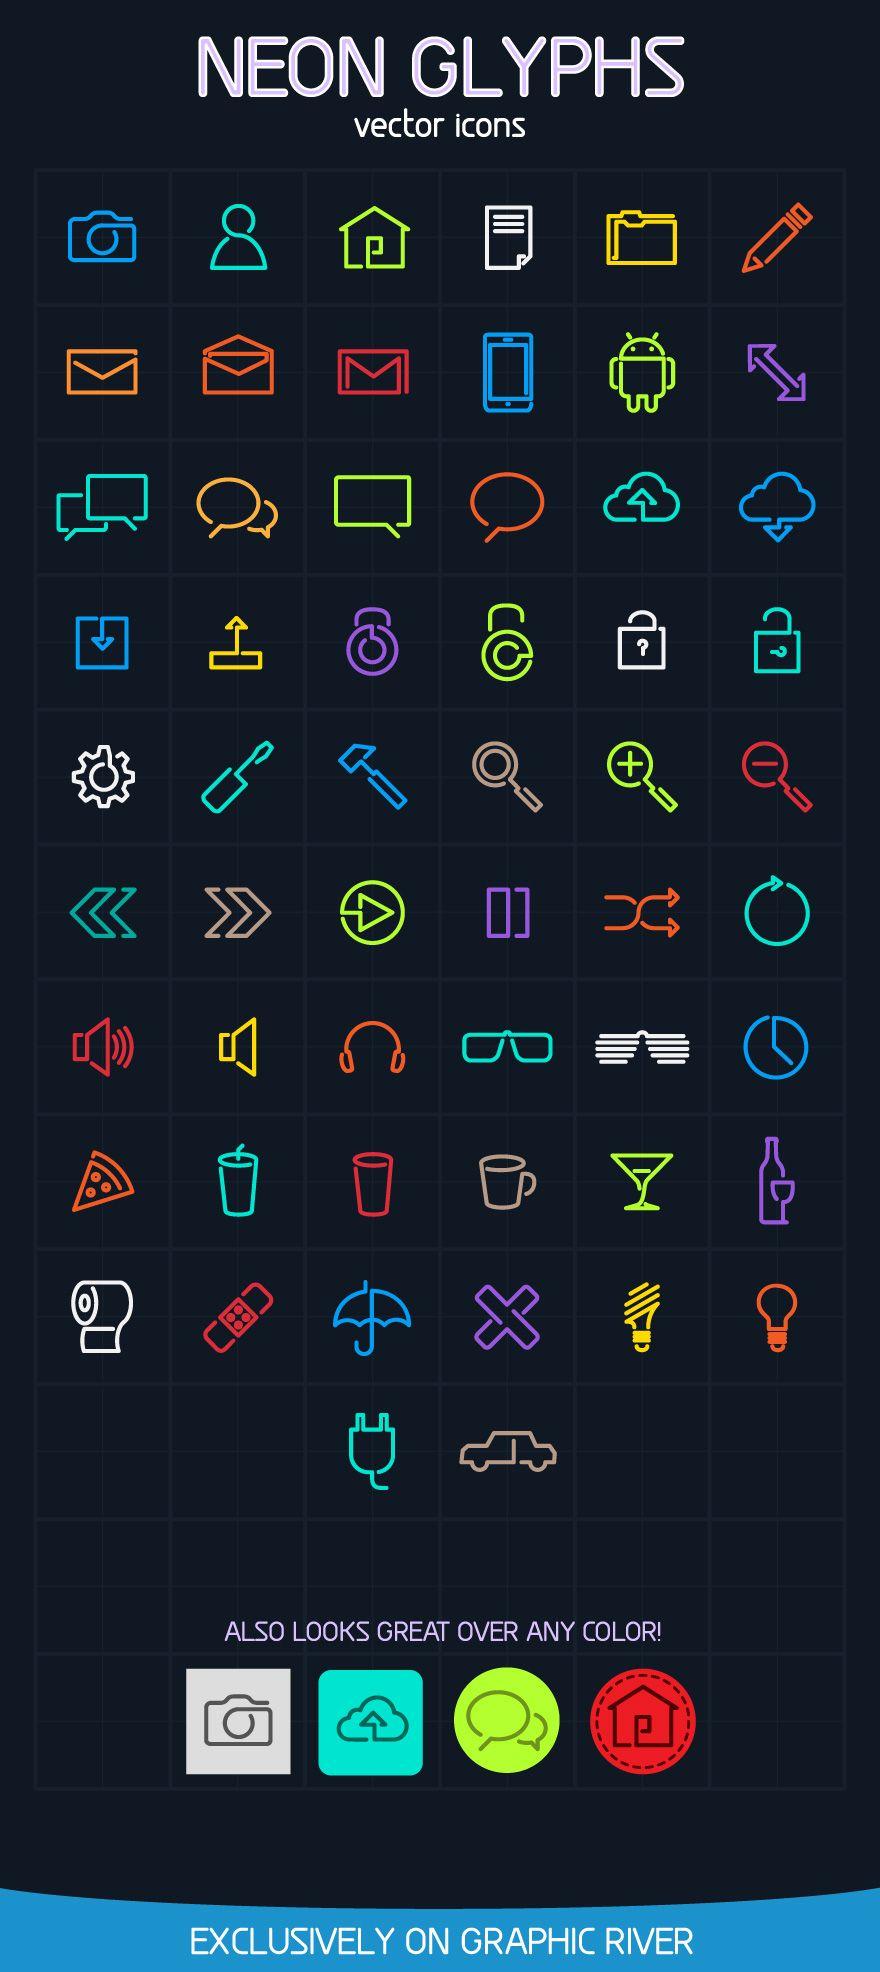 Neon Glyphs Vector Icons by Xiao Ali (via Creattica